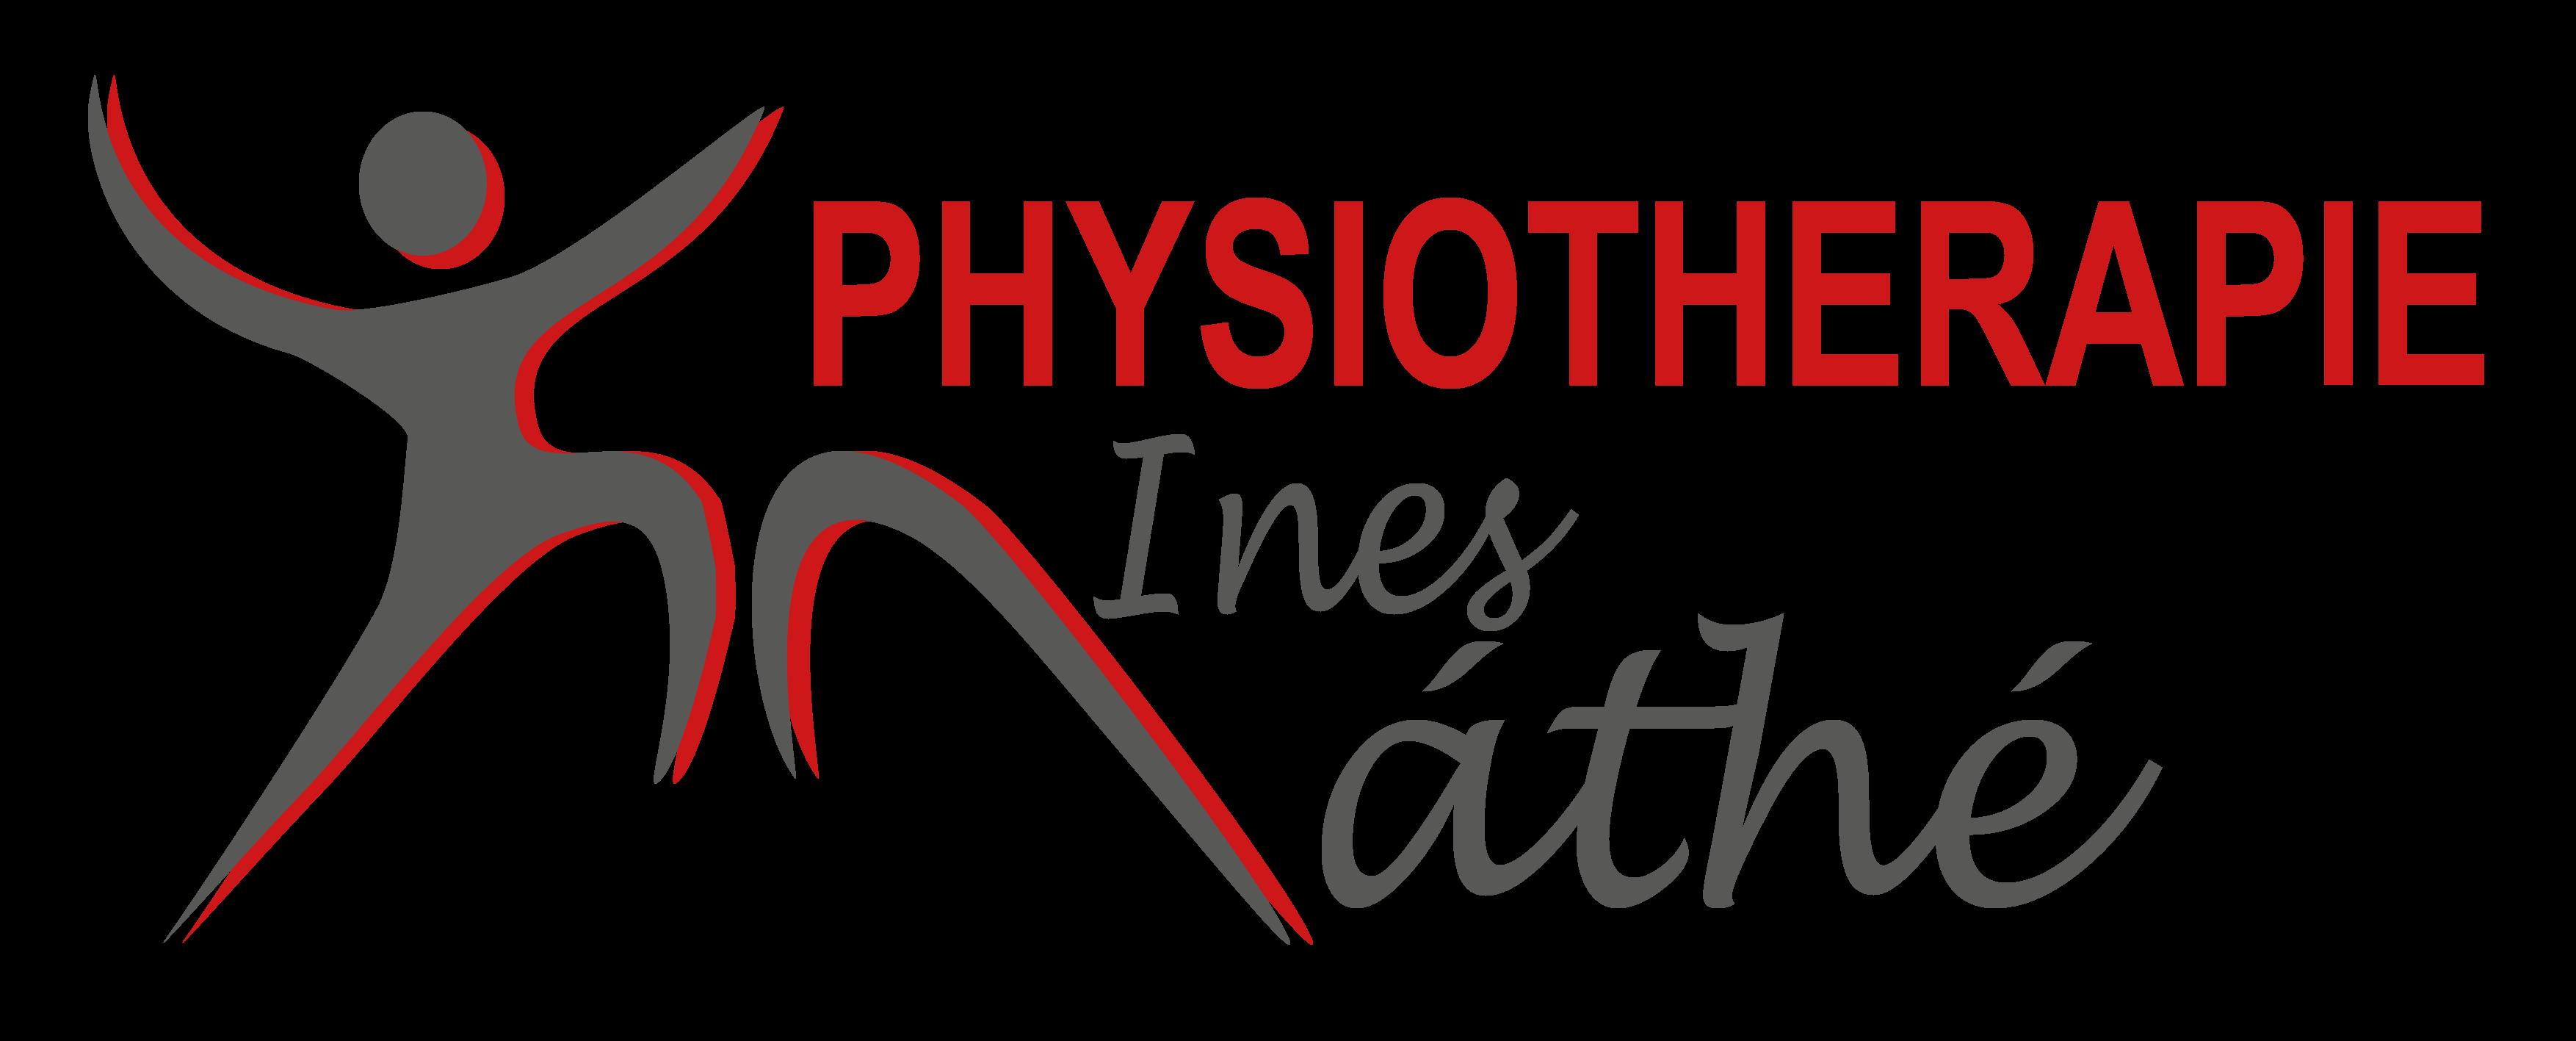 Physiotherapie Mathe